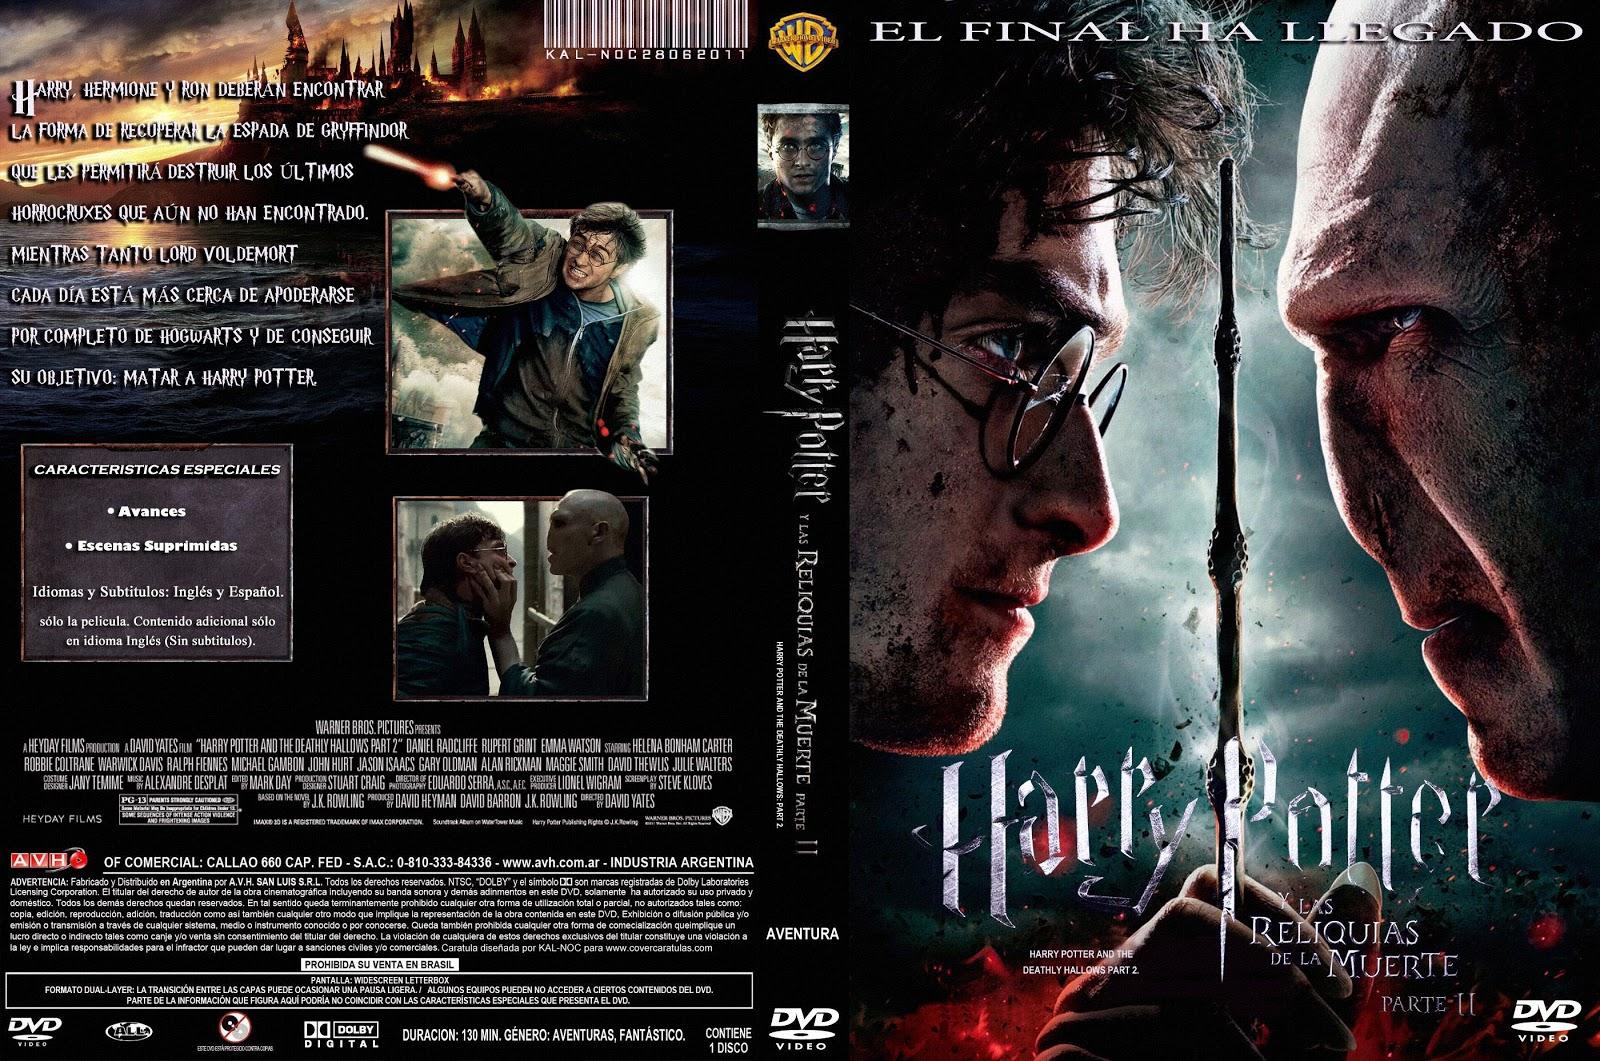 http://1.bp.blogspot.com/-X5HqZ0OUBYQ/TqBpRXGKutI/AAAAAAAAAnQ/vx9uHN2RxLE/s1600/Harry_Potter_Y_Las_Reliquias_De_La_Muerte_-_Parte_2_-_Custom_por_kal-noc_%255Bdvd%255D_80.jpg